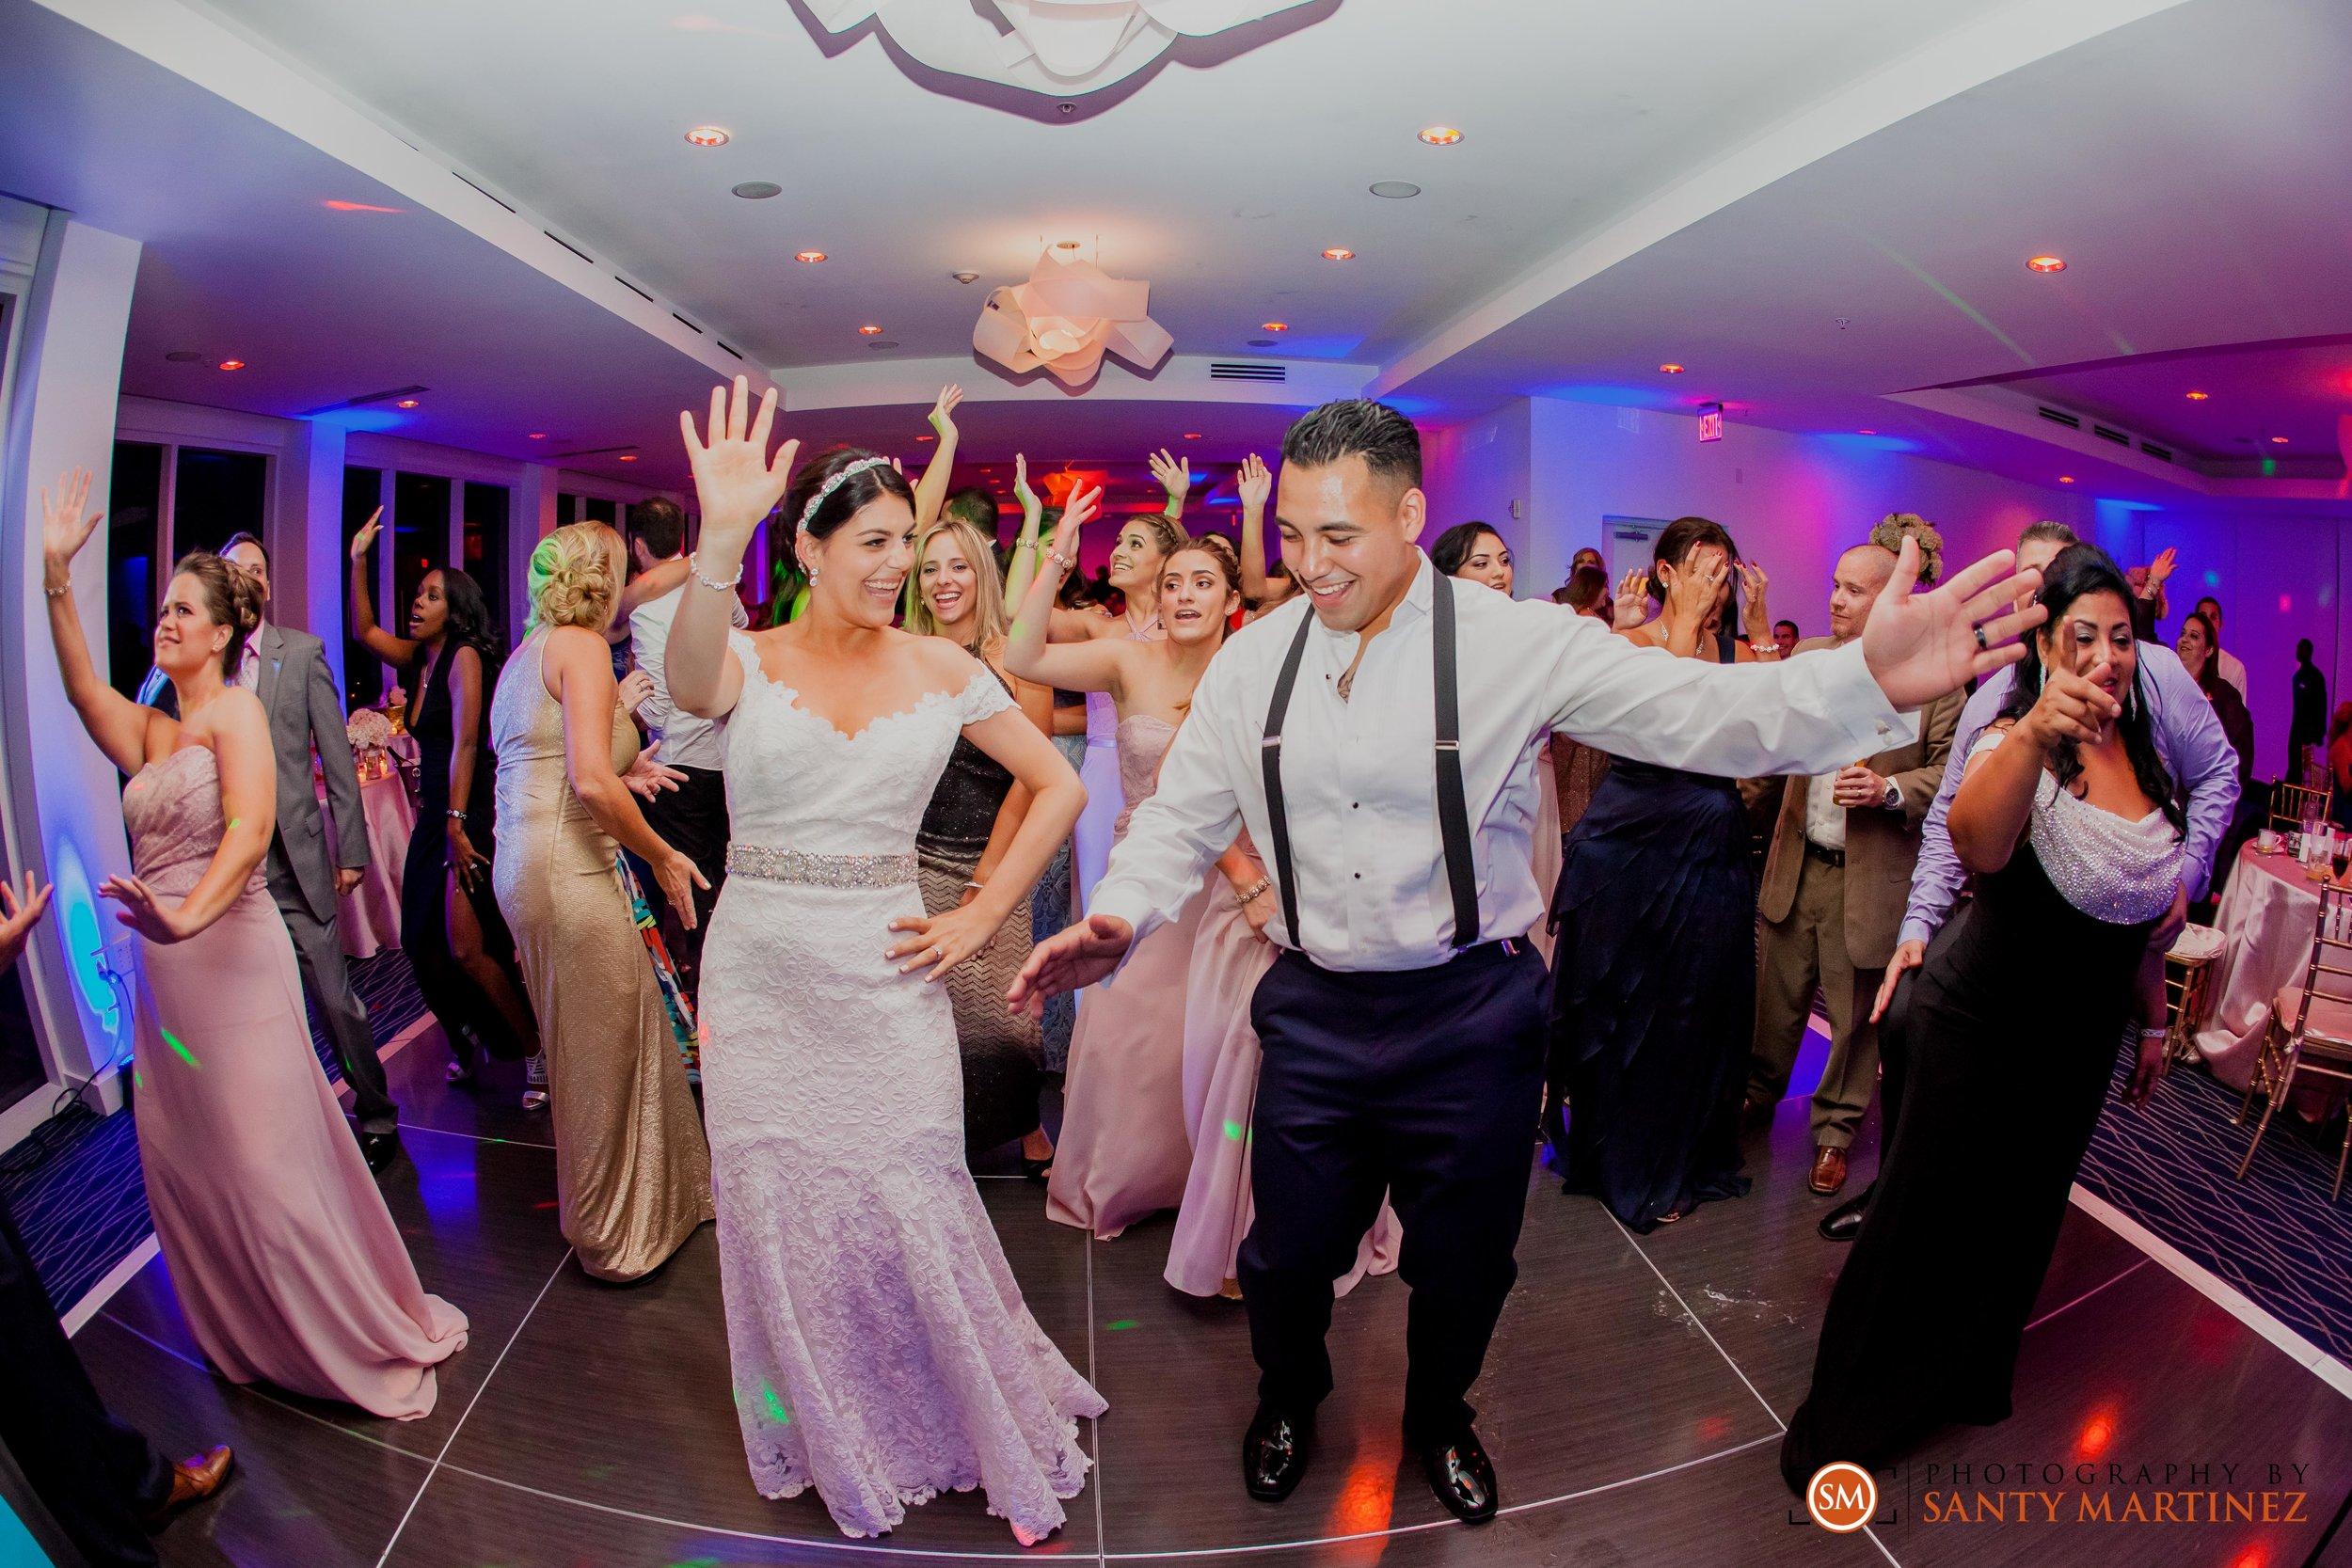 Miami Wedding Photographer - Santy Martinez-40.jpg